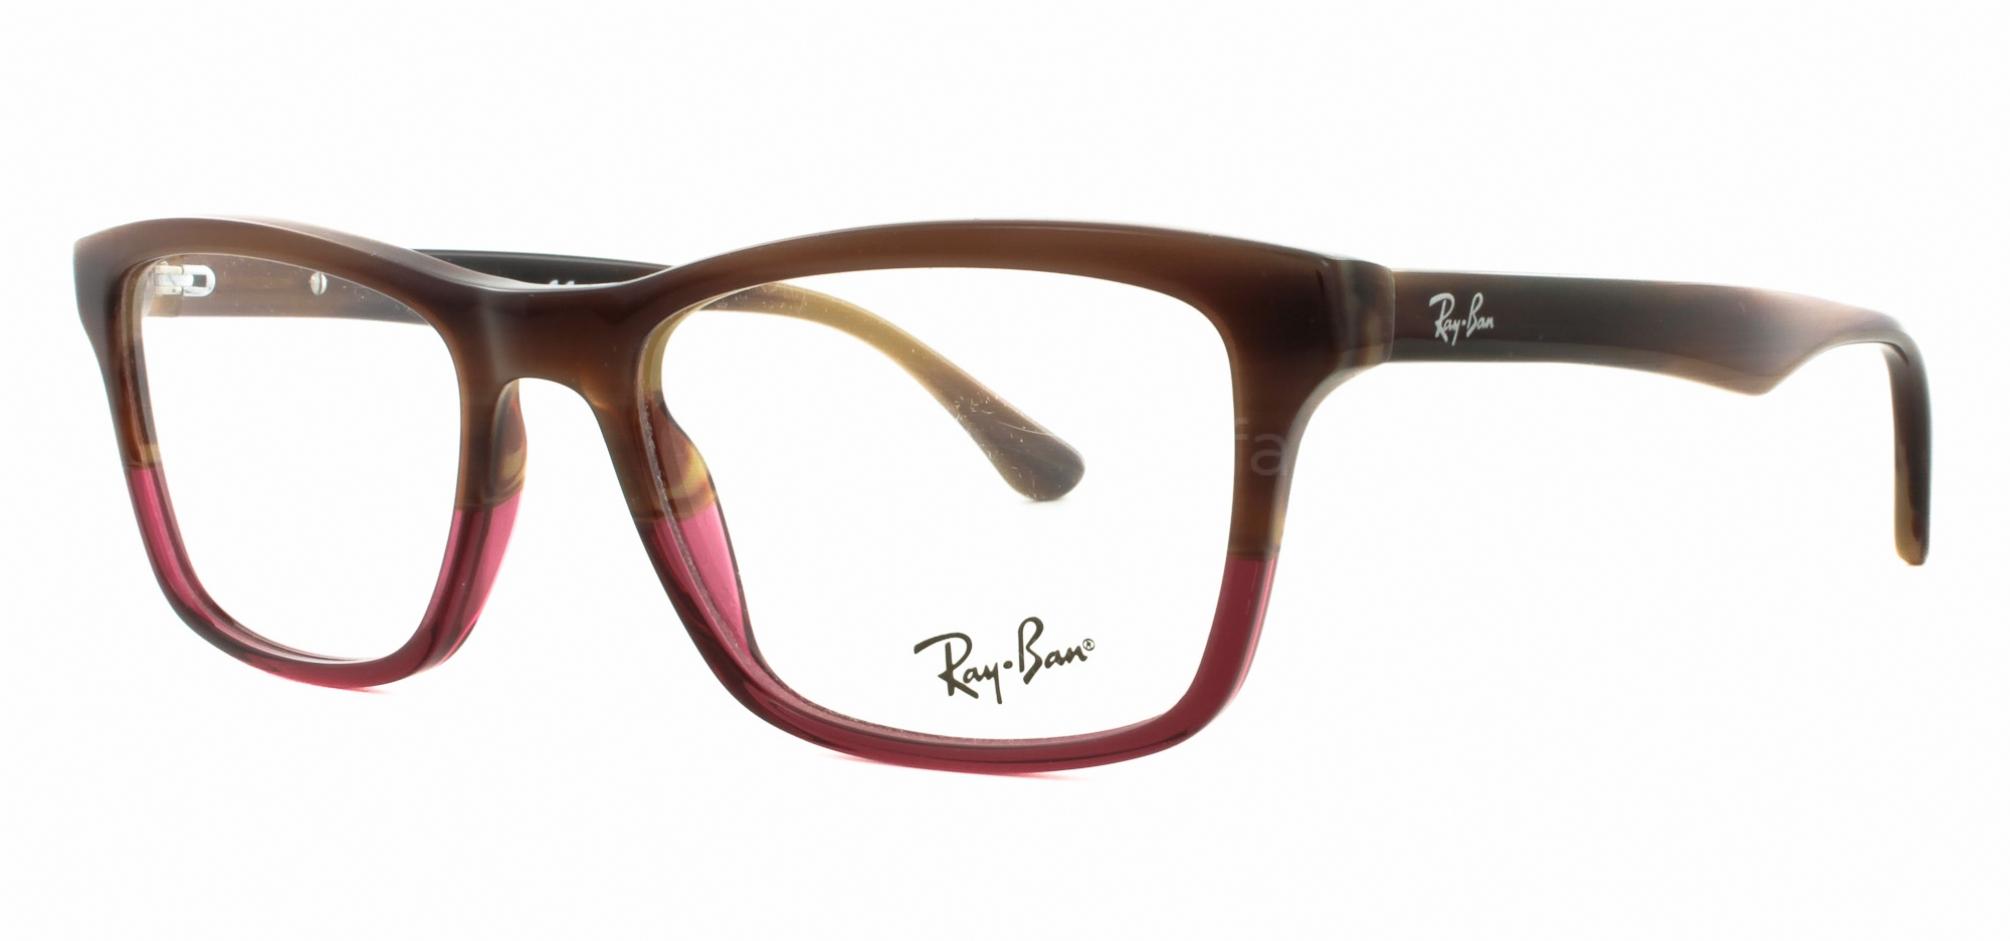 d0e6b1a5447b Ray Ban Sunglass Case Indiana. Ray Ban 5279 Glasses